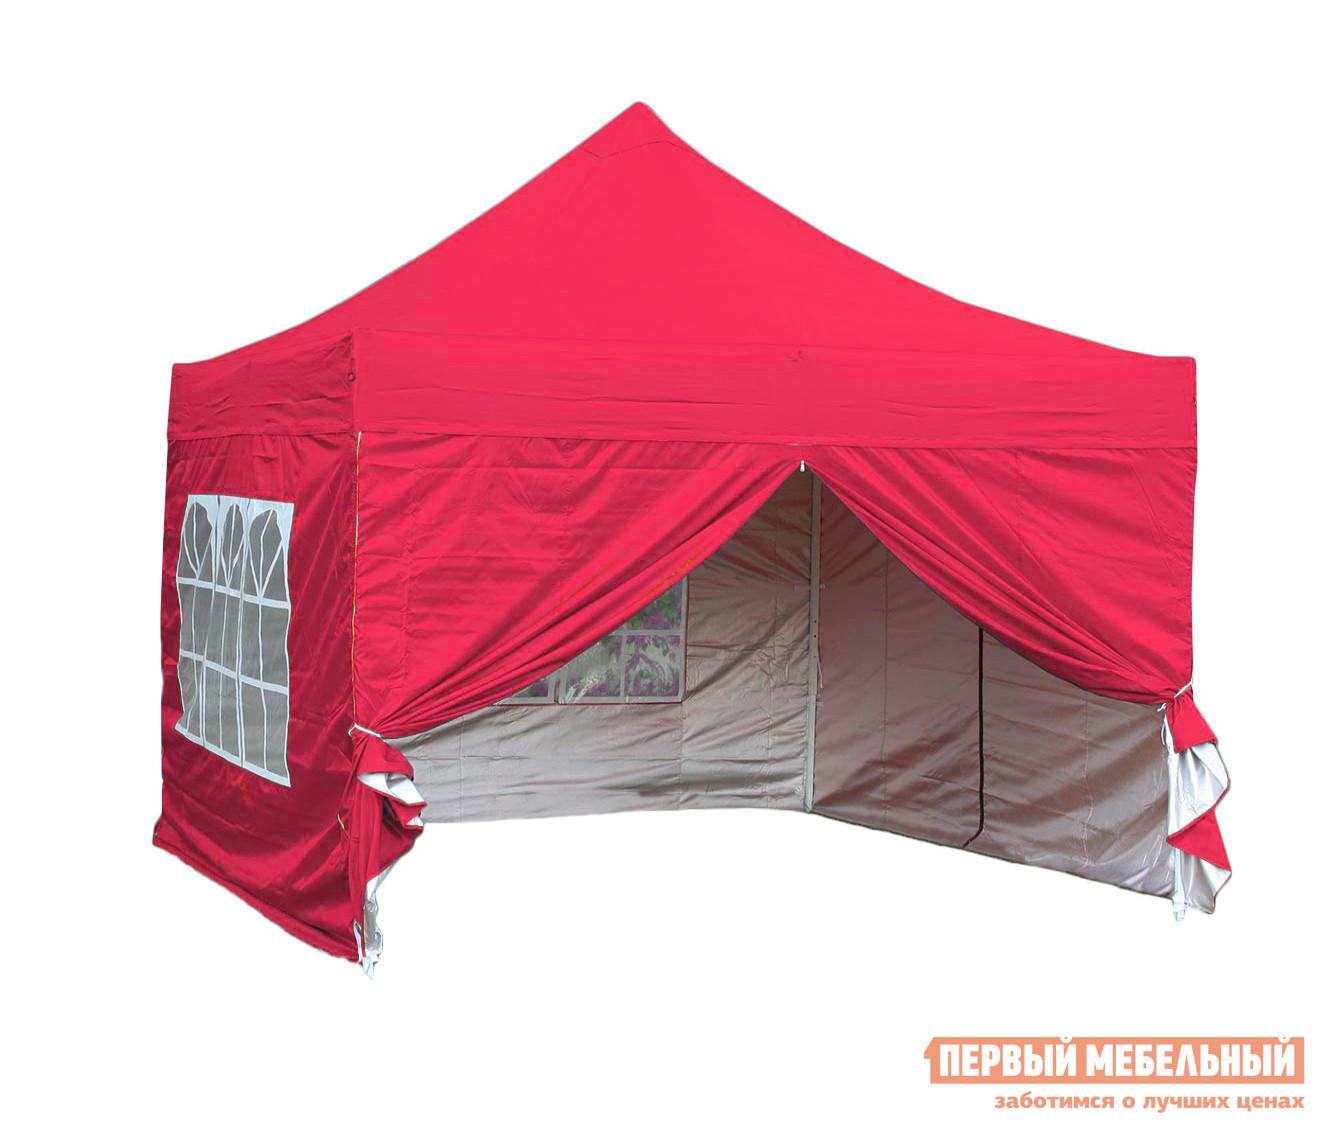 Раздвижной шатер-гармошка Giza Garden Гиза Эко 2х3 раздвижной шатер гармошка giza garden гиза эко 3х3